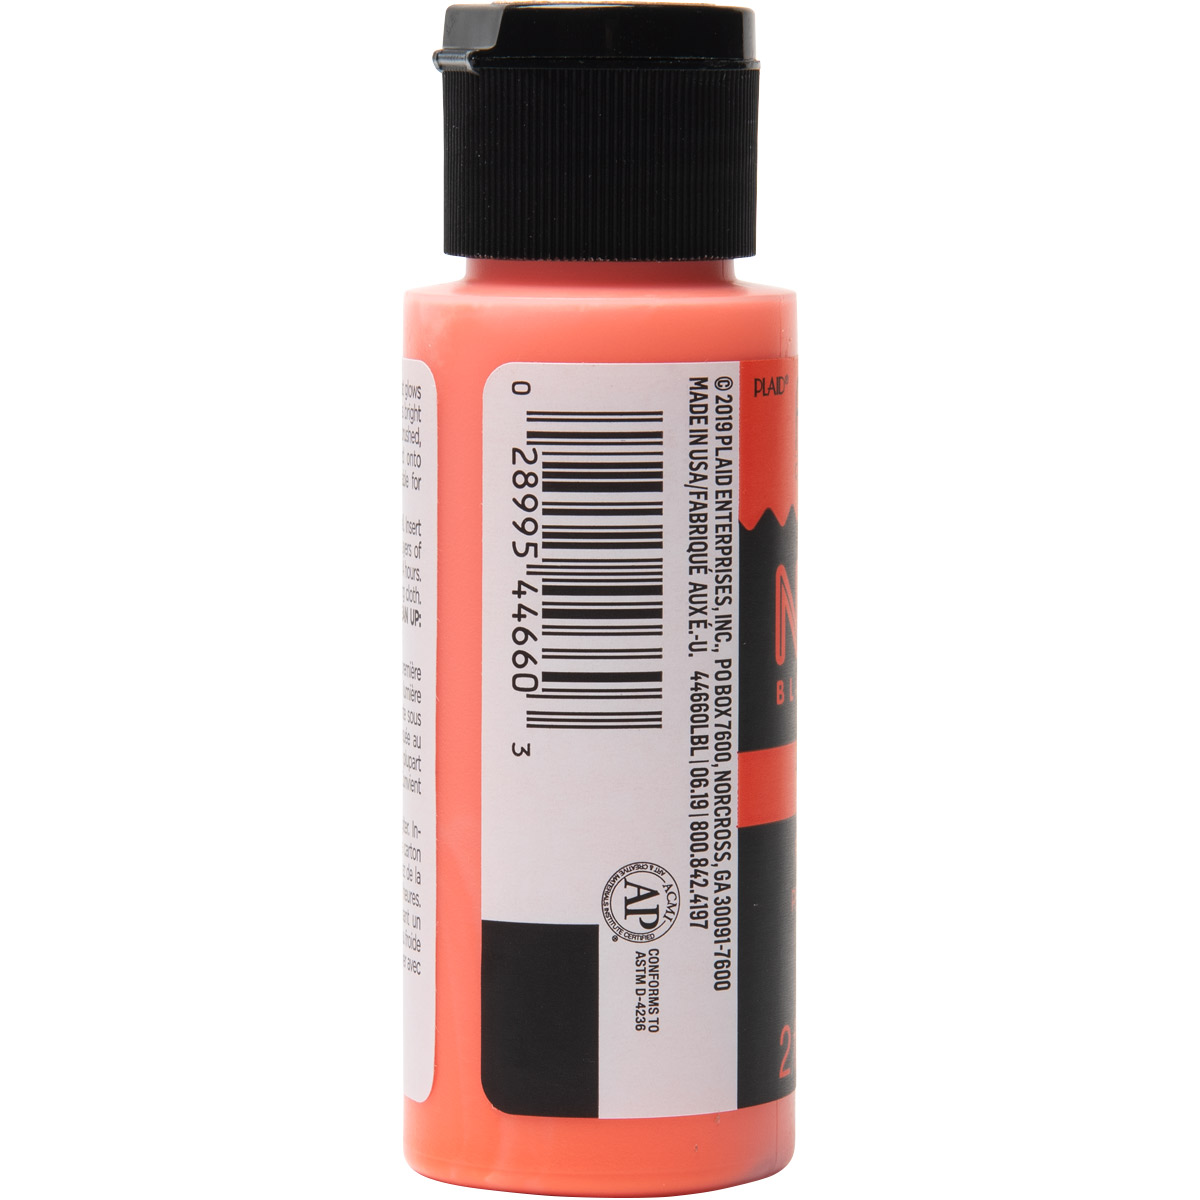 Fabric Creations™ Neon Black Light Fabric Paint - Orange, 2 oz.